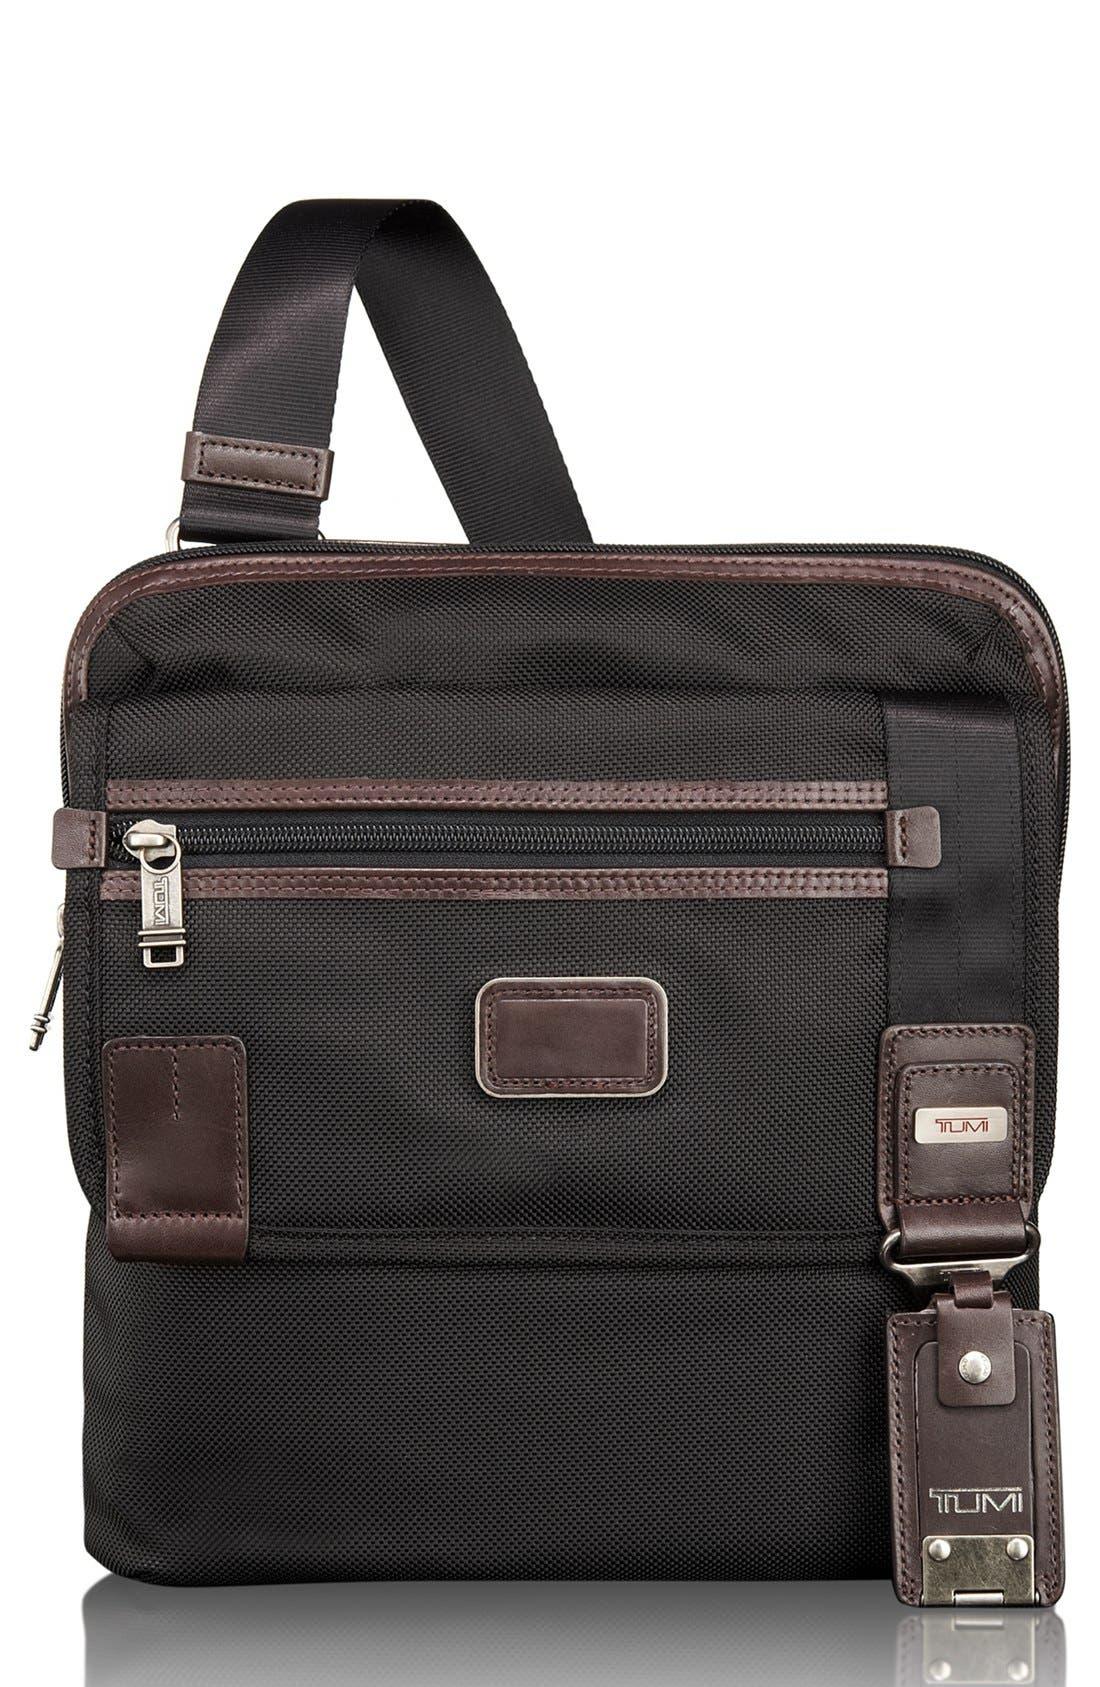 TUMI 'Alpha Bravo - Annapolis' Zip Flap Messenger Bag, Main, color, 001